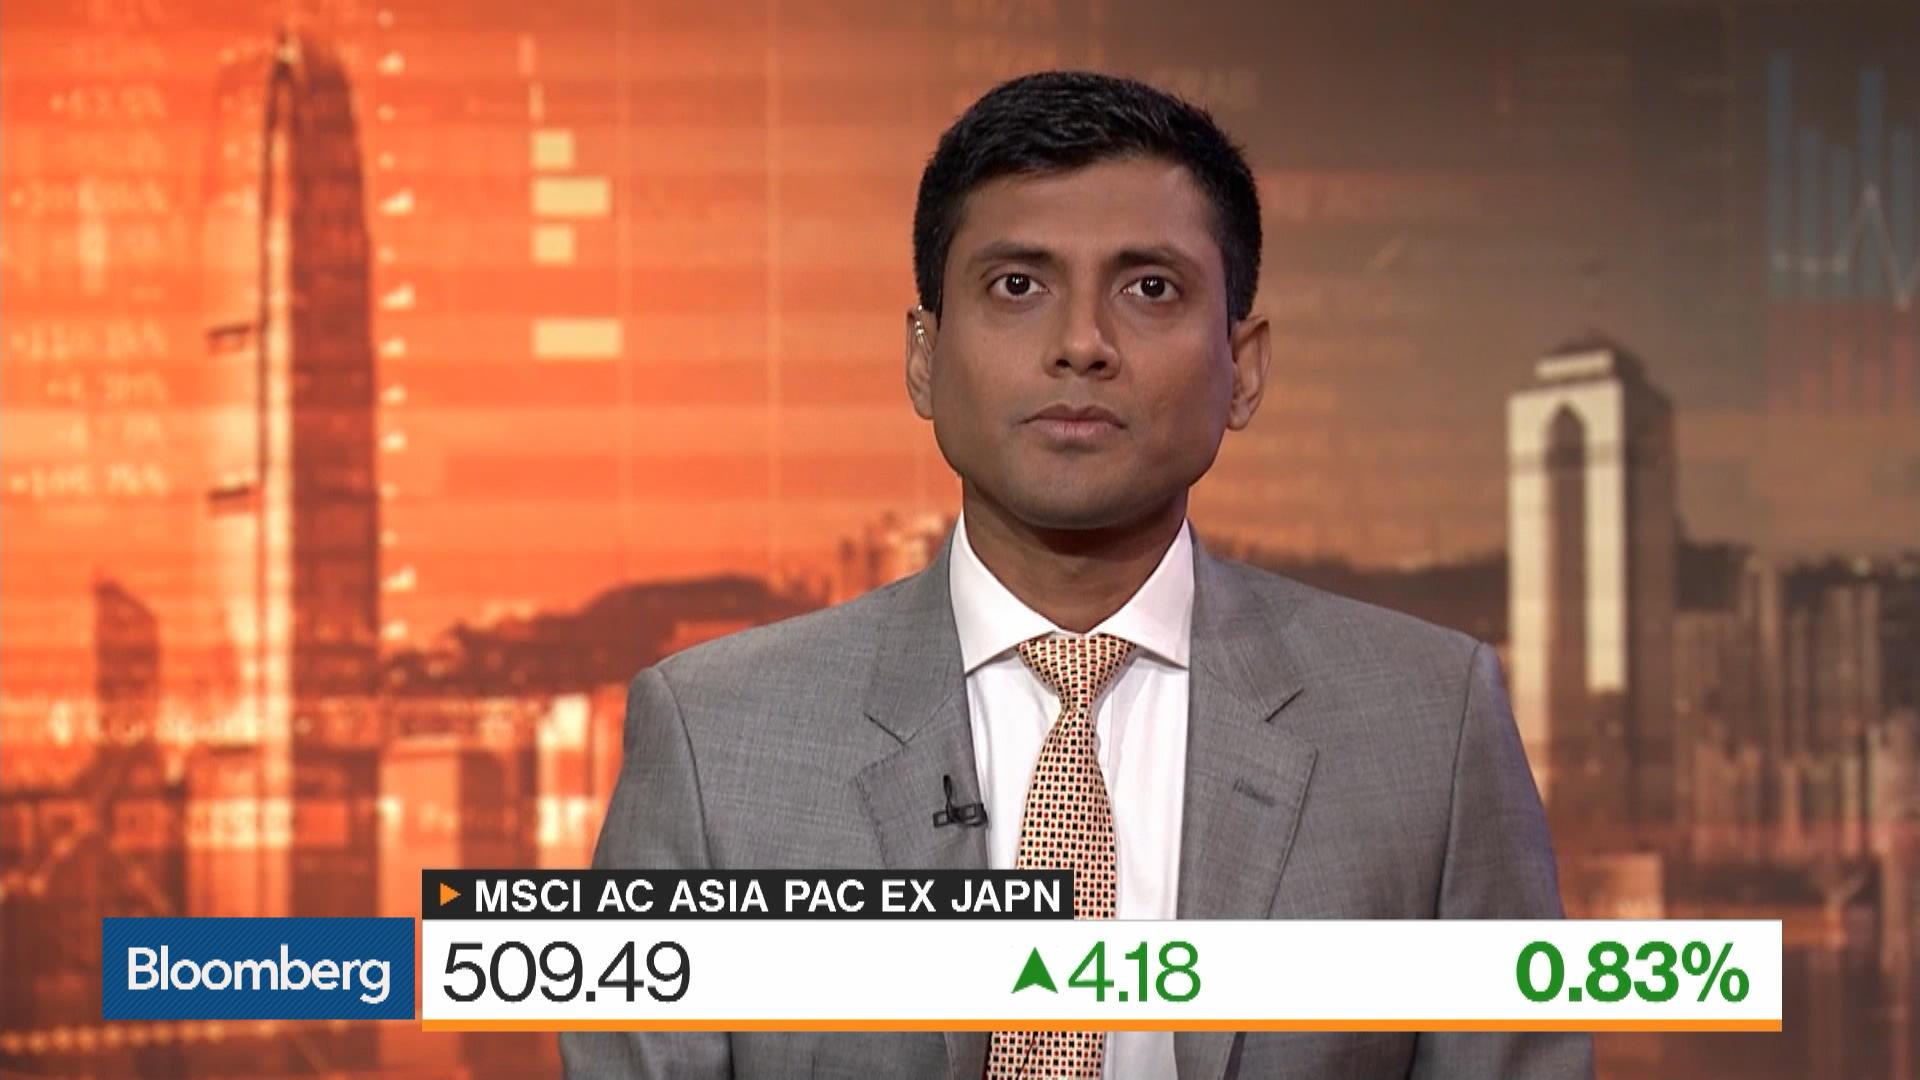 JPMorgan Asia Equity Strategist Mixo Das on U.S.-China Trade, Market Outlook